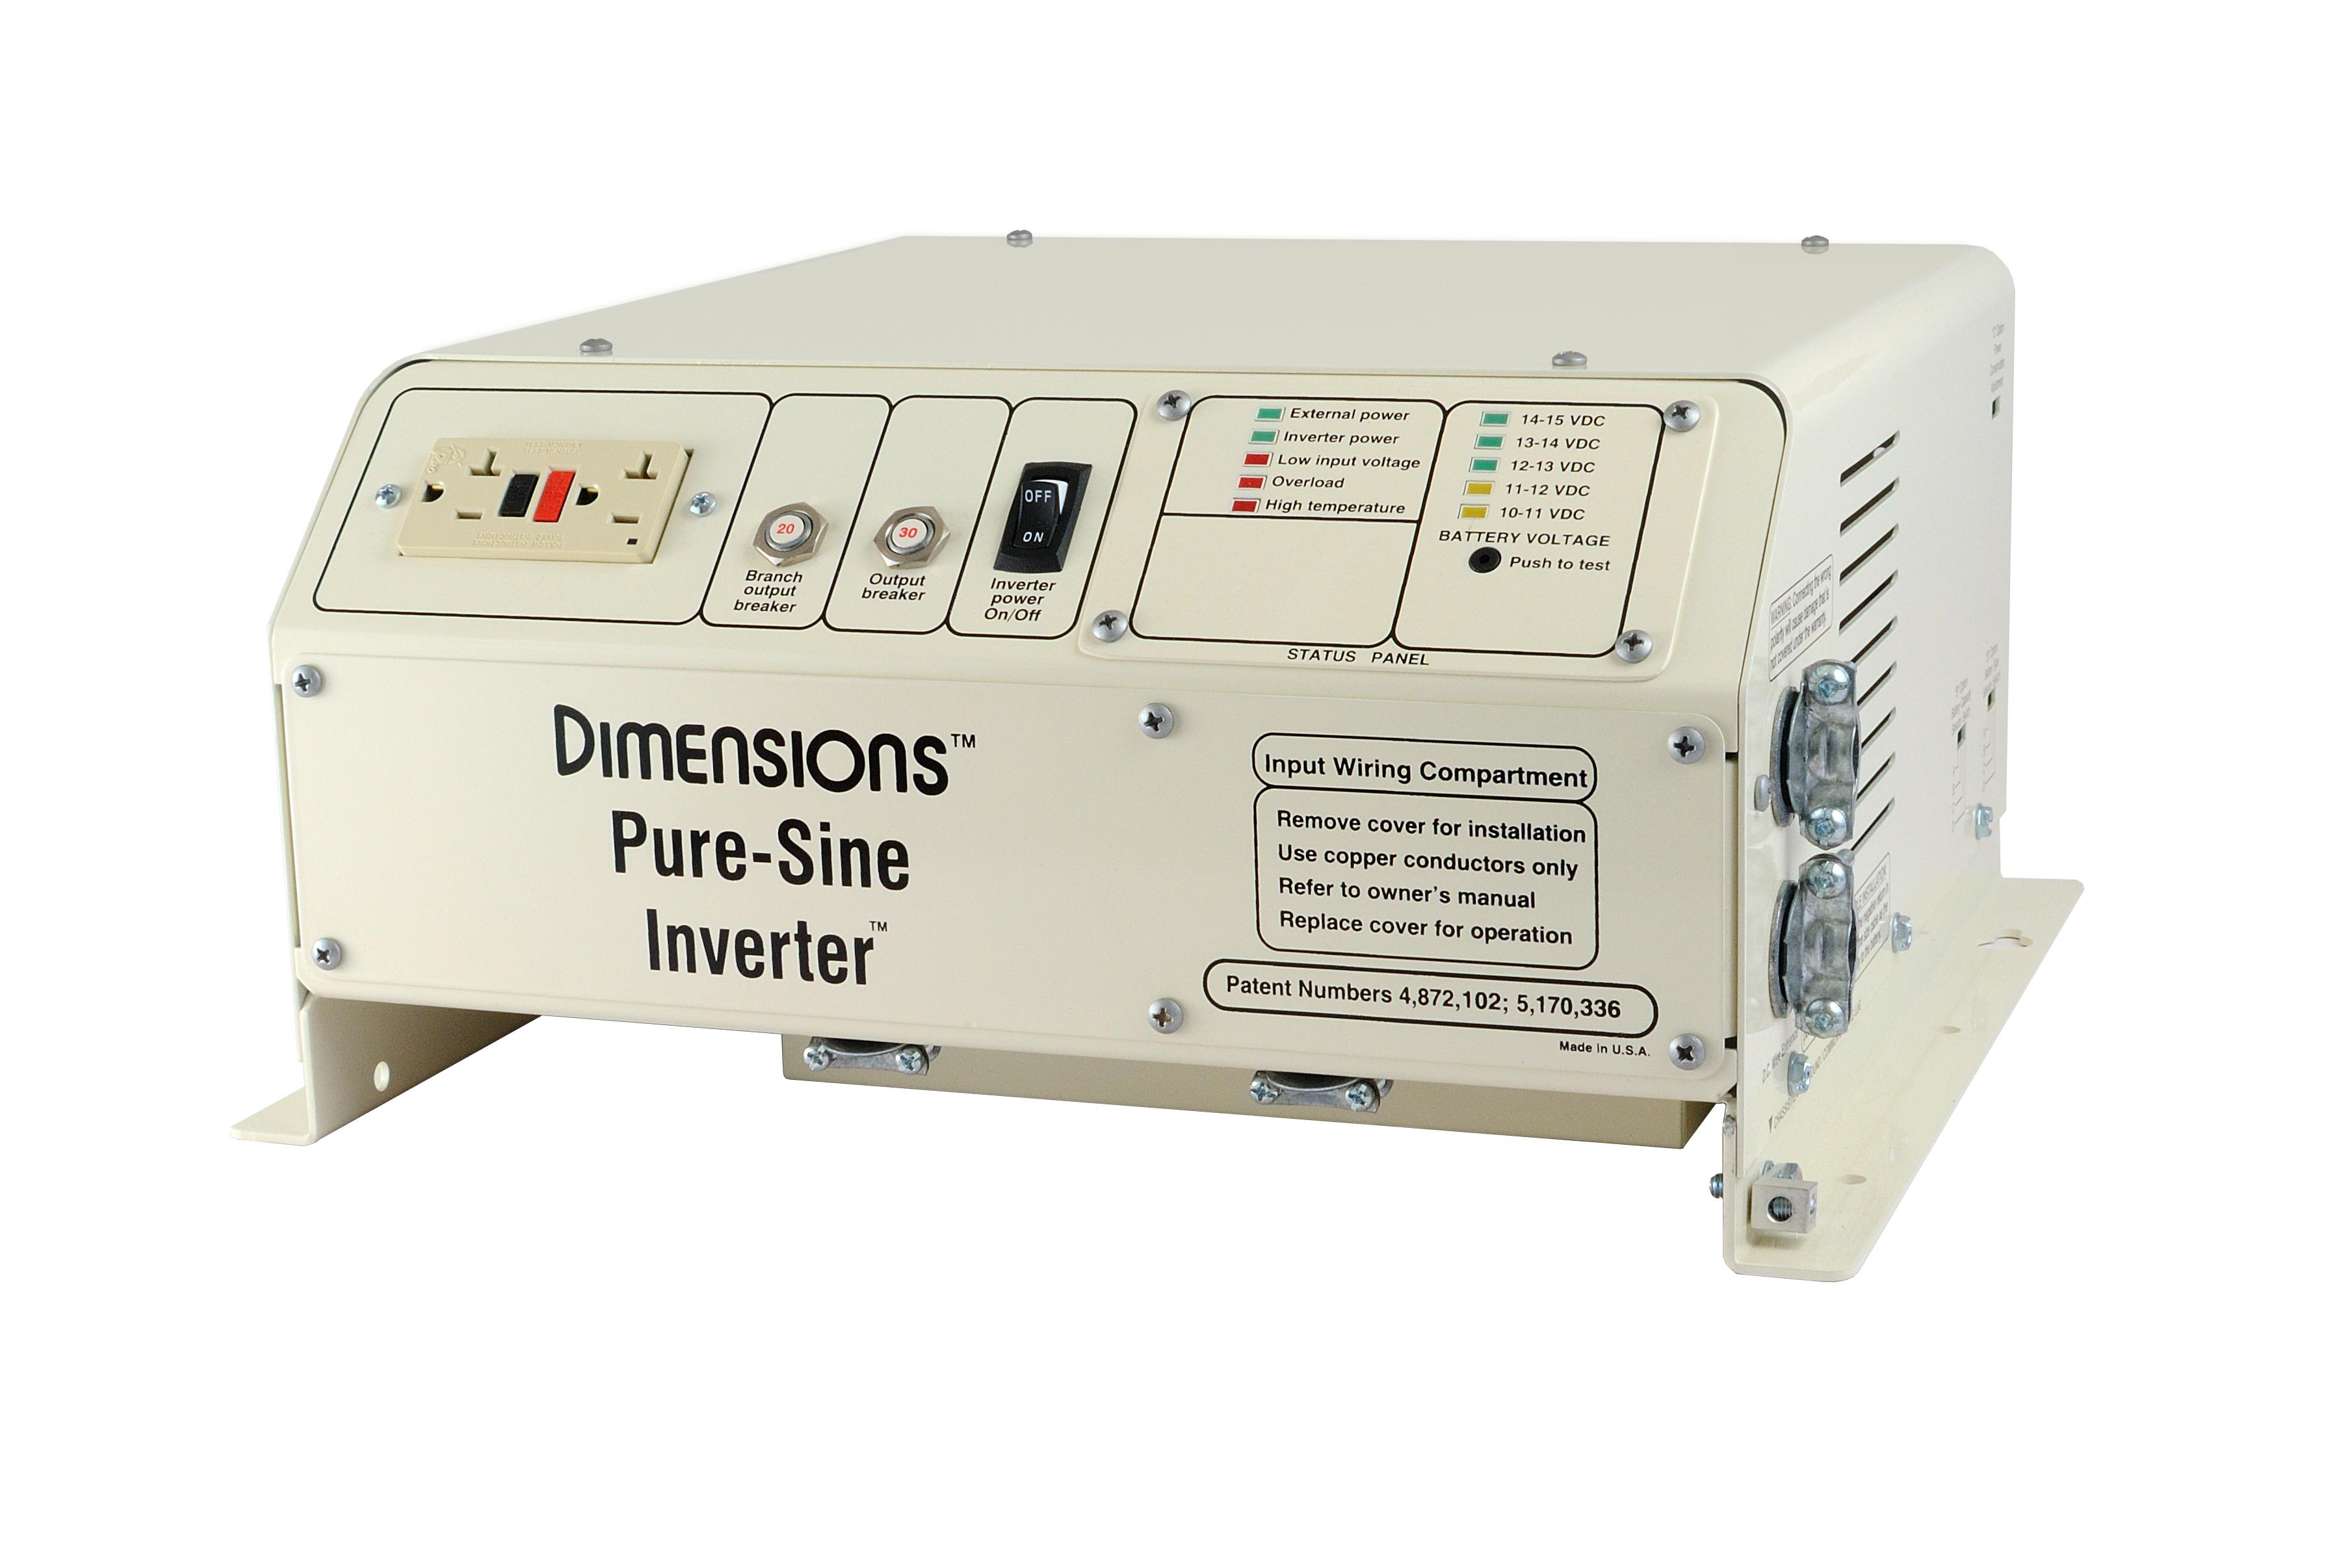 1800w 12vdc Pure Sine Inverter N Series Magnum Dimensions 12 Vdc 120 Vac Schematic Airpax